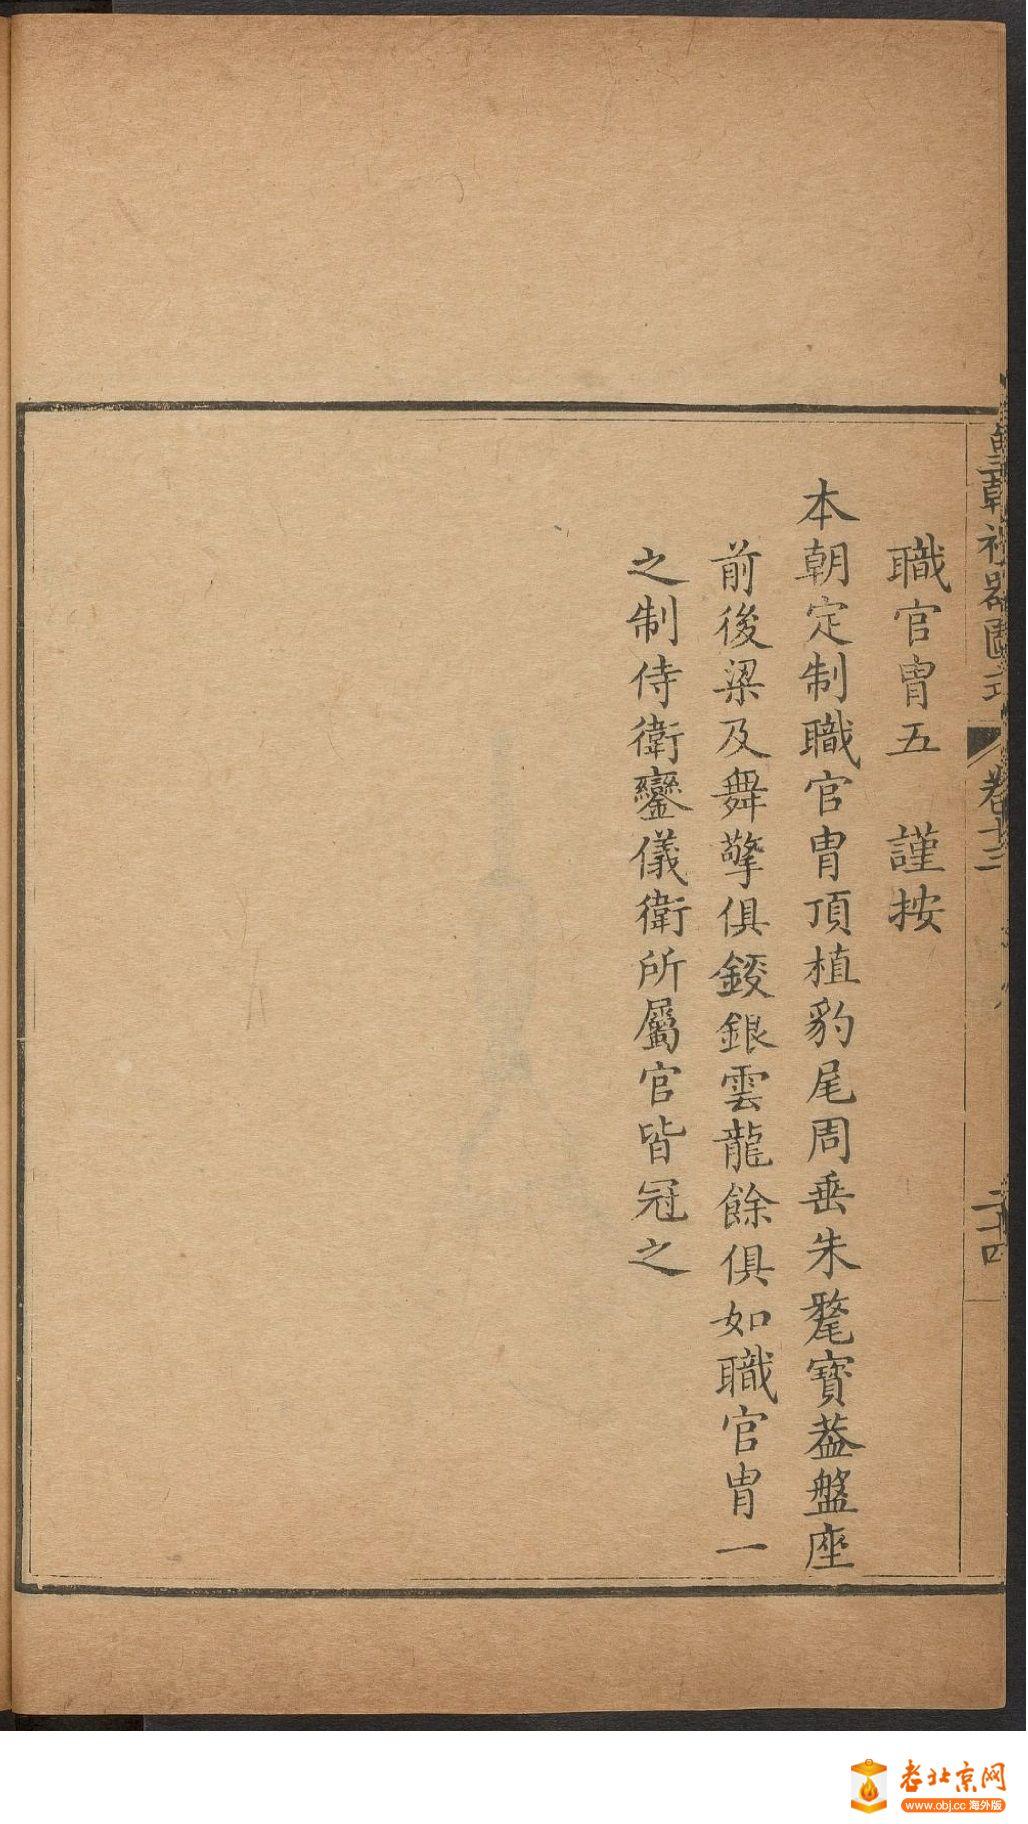 3_page5_image1b.jpg